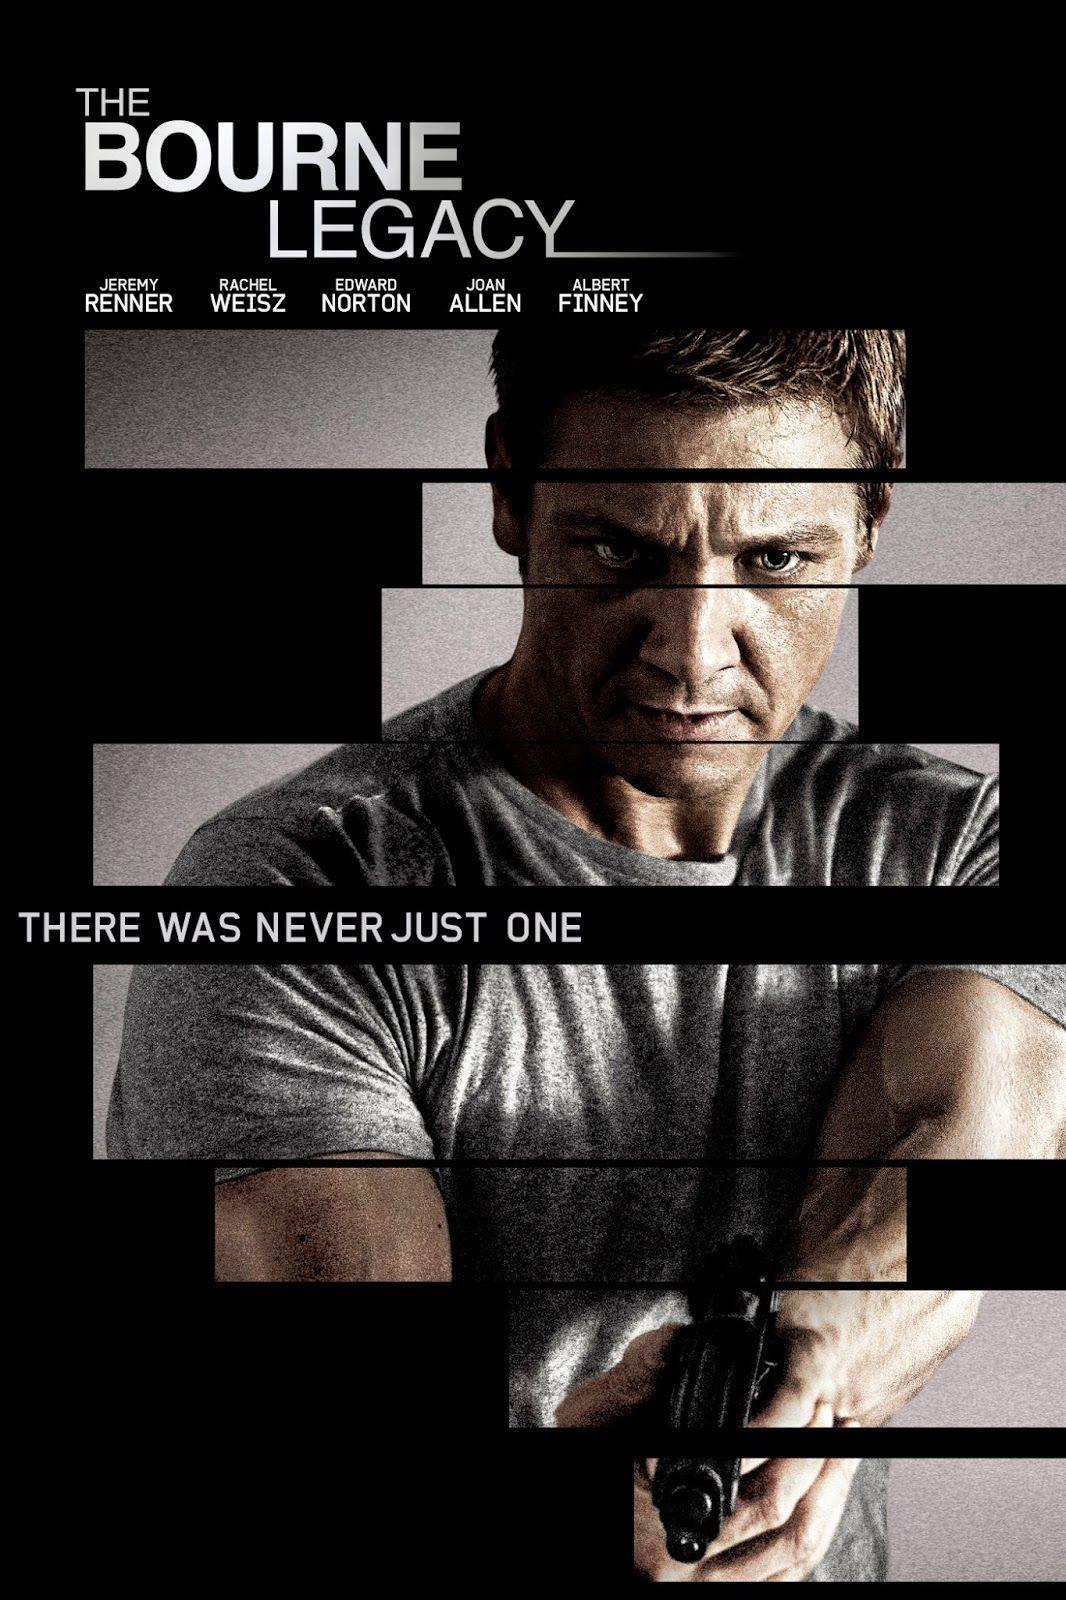 bourne legacy full movie watch online free